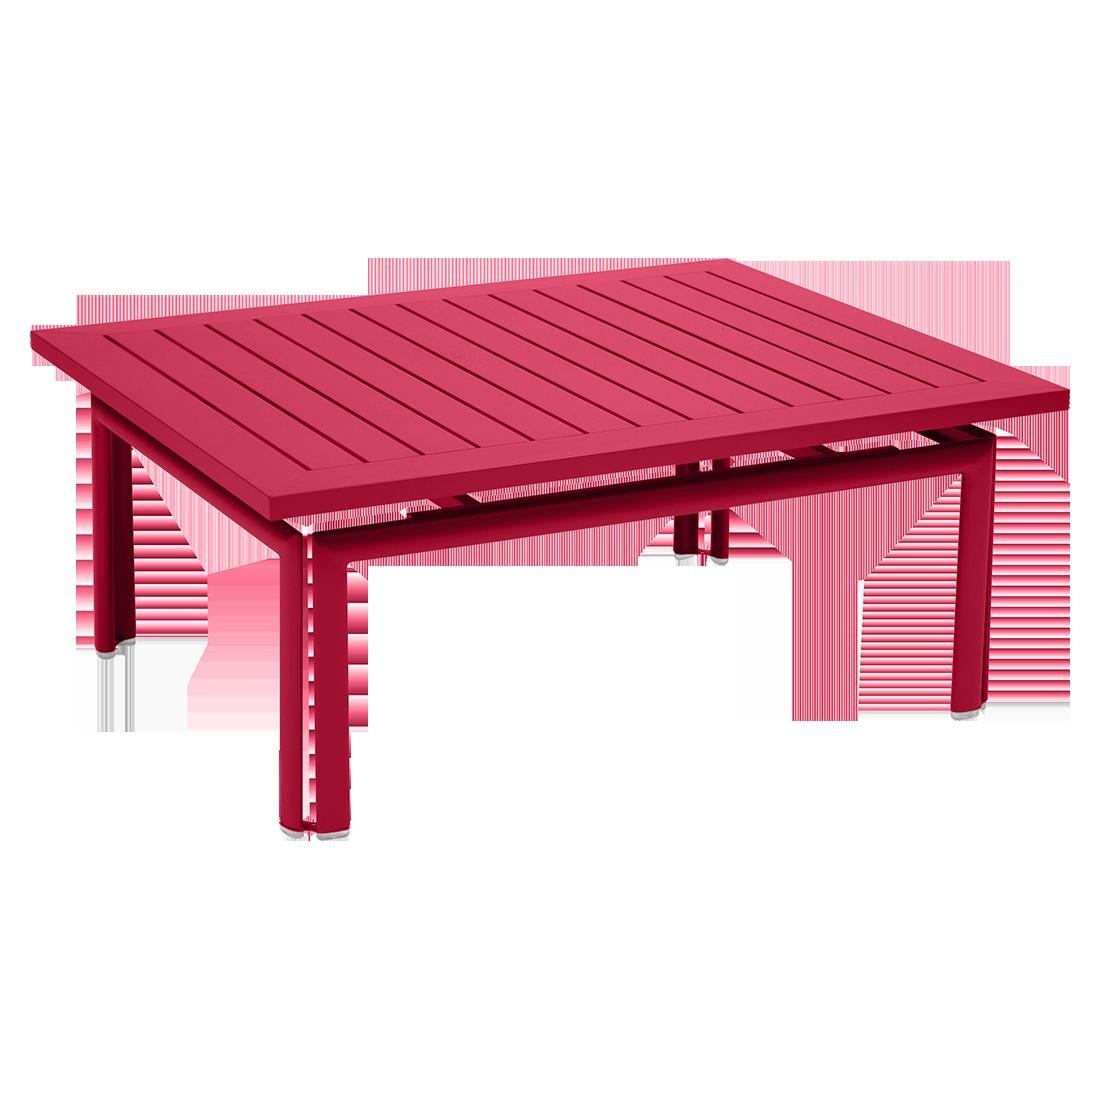 table basse metal, table basse de jardin, table basse rose